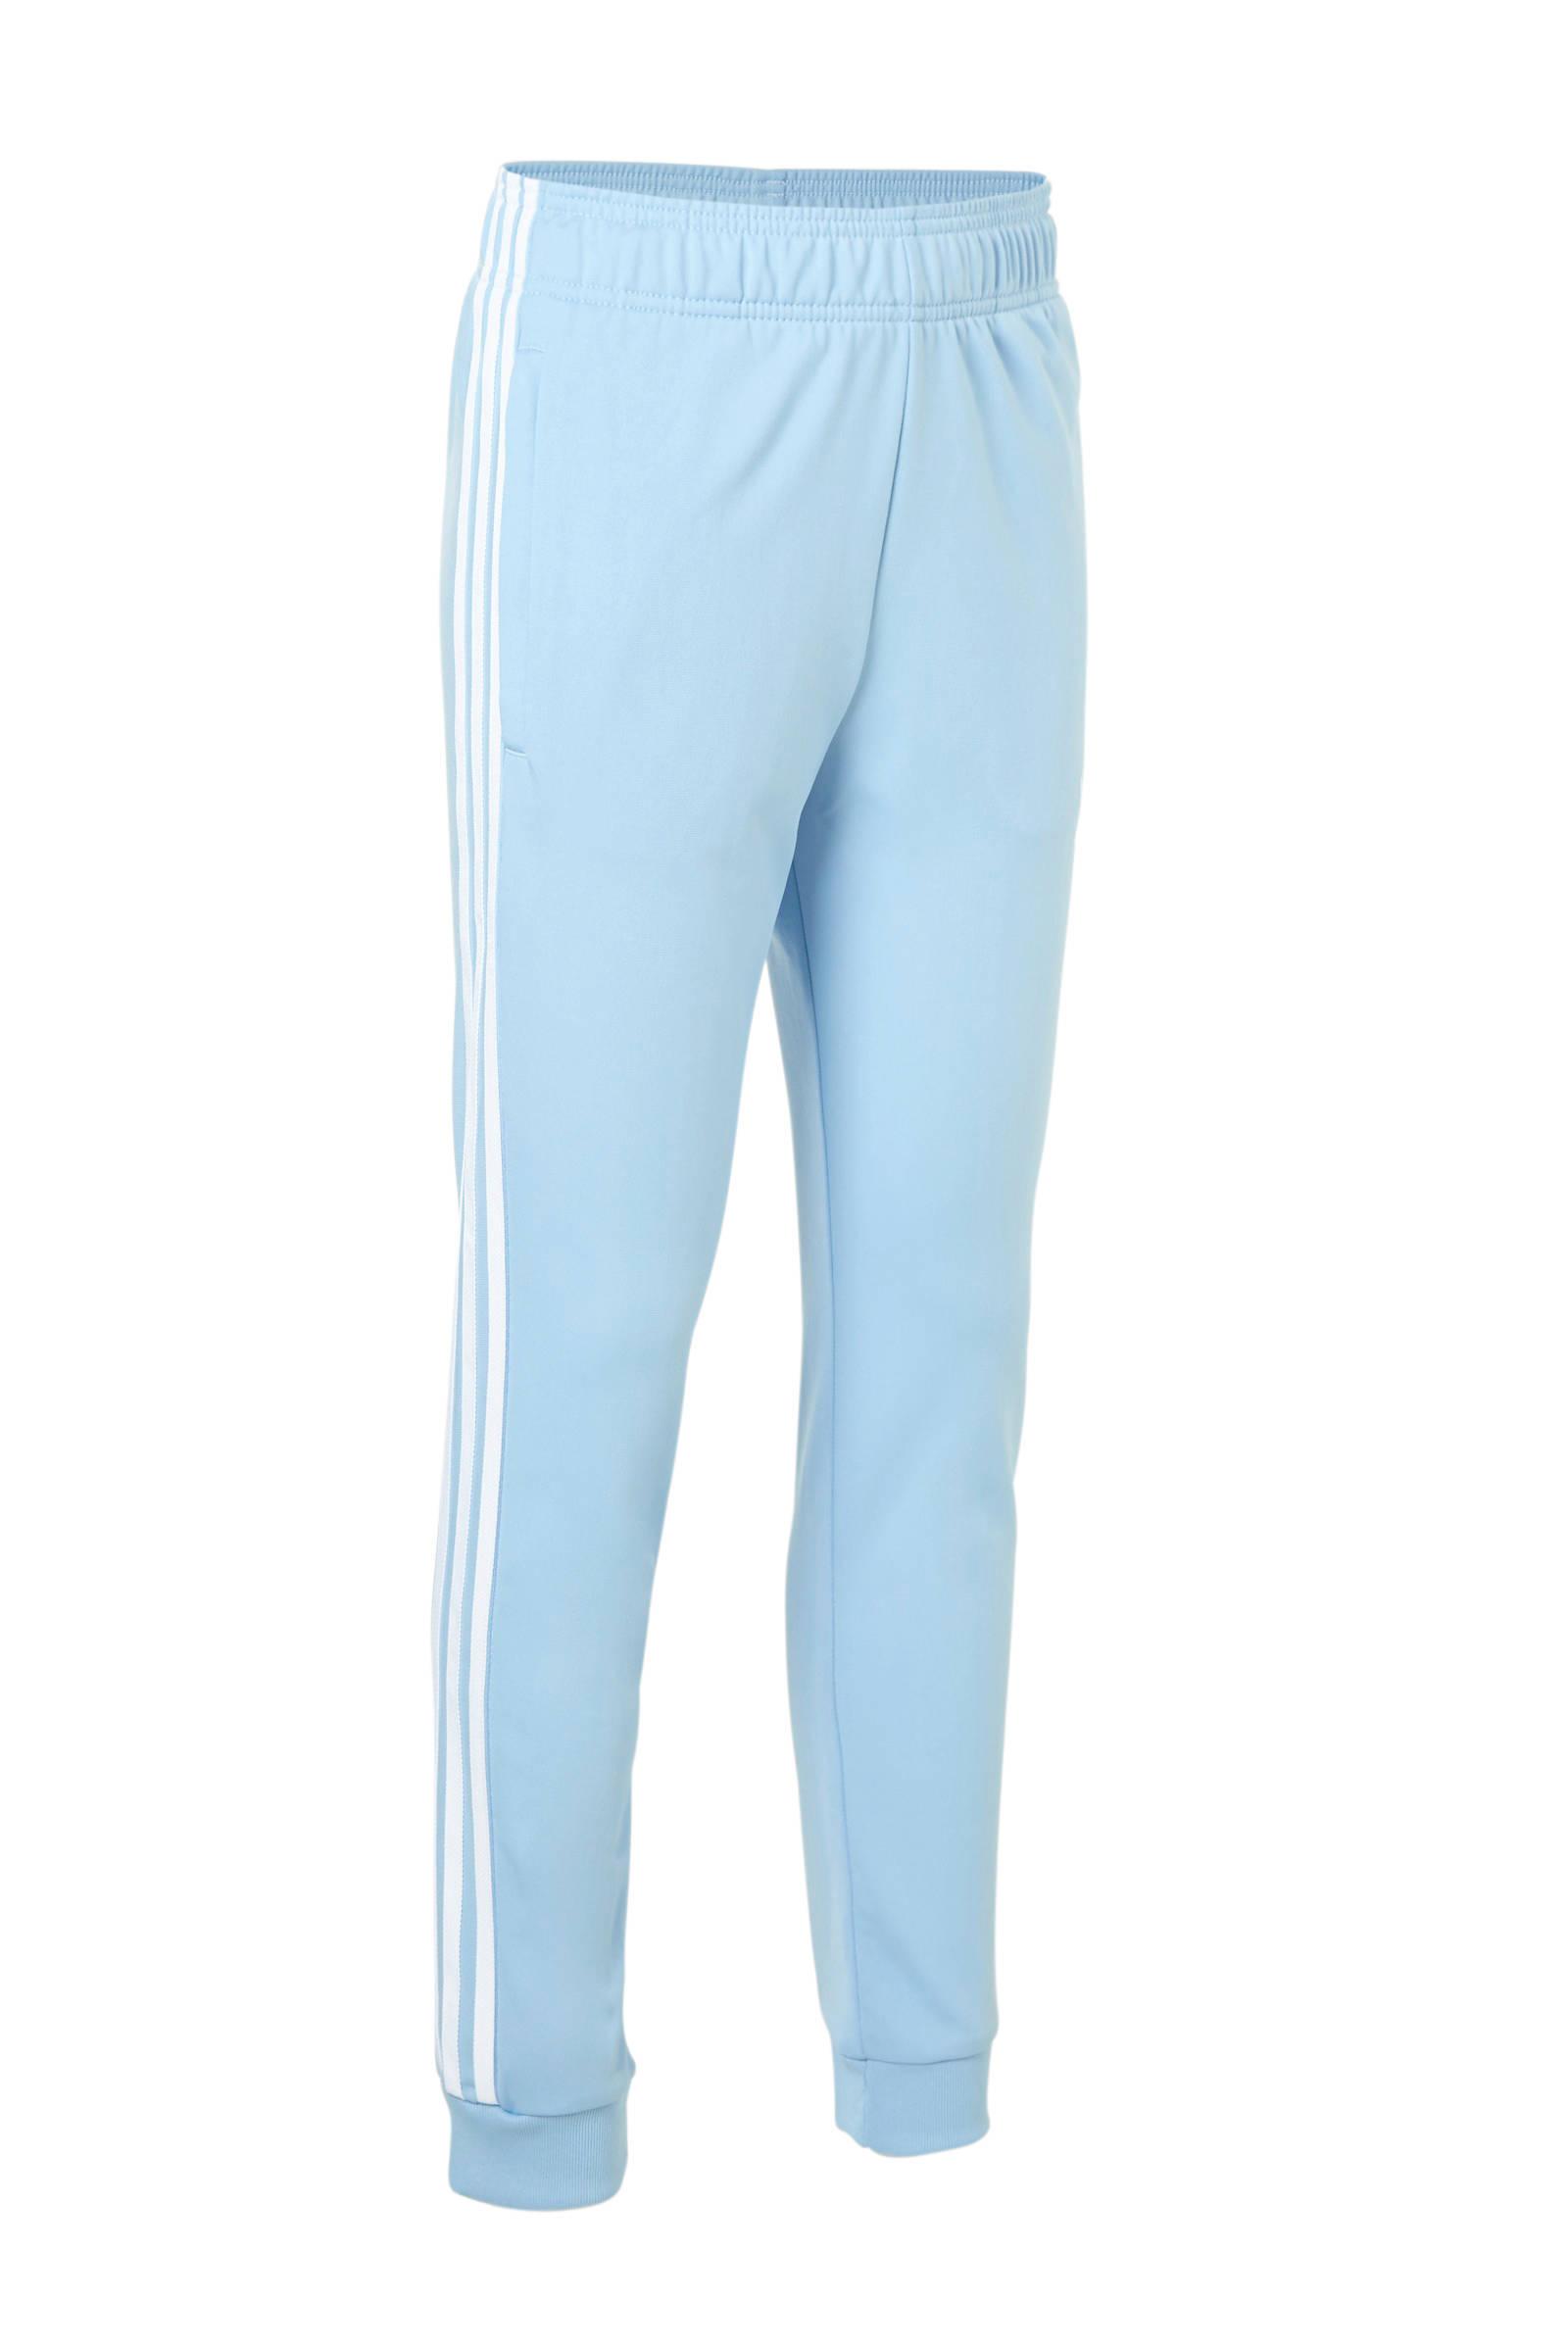 adidas originals trainingsbroek lichtblauw | wehkamp